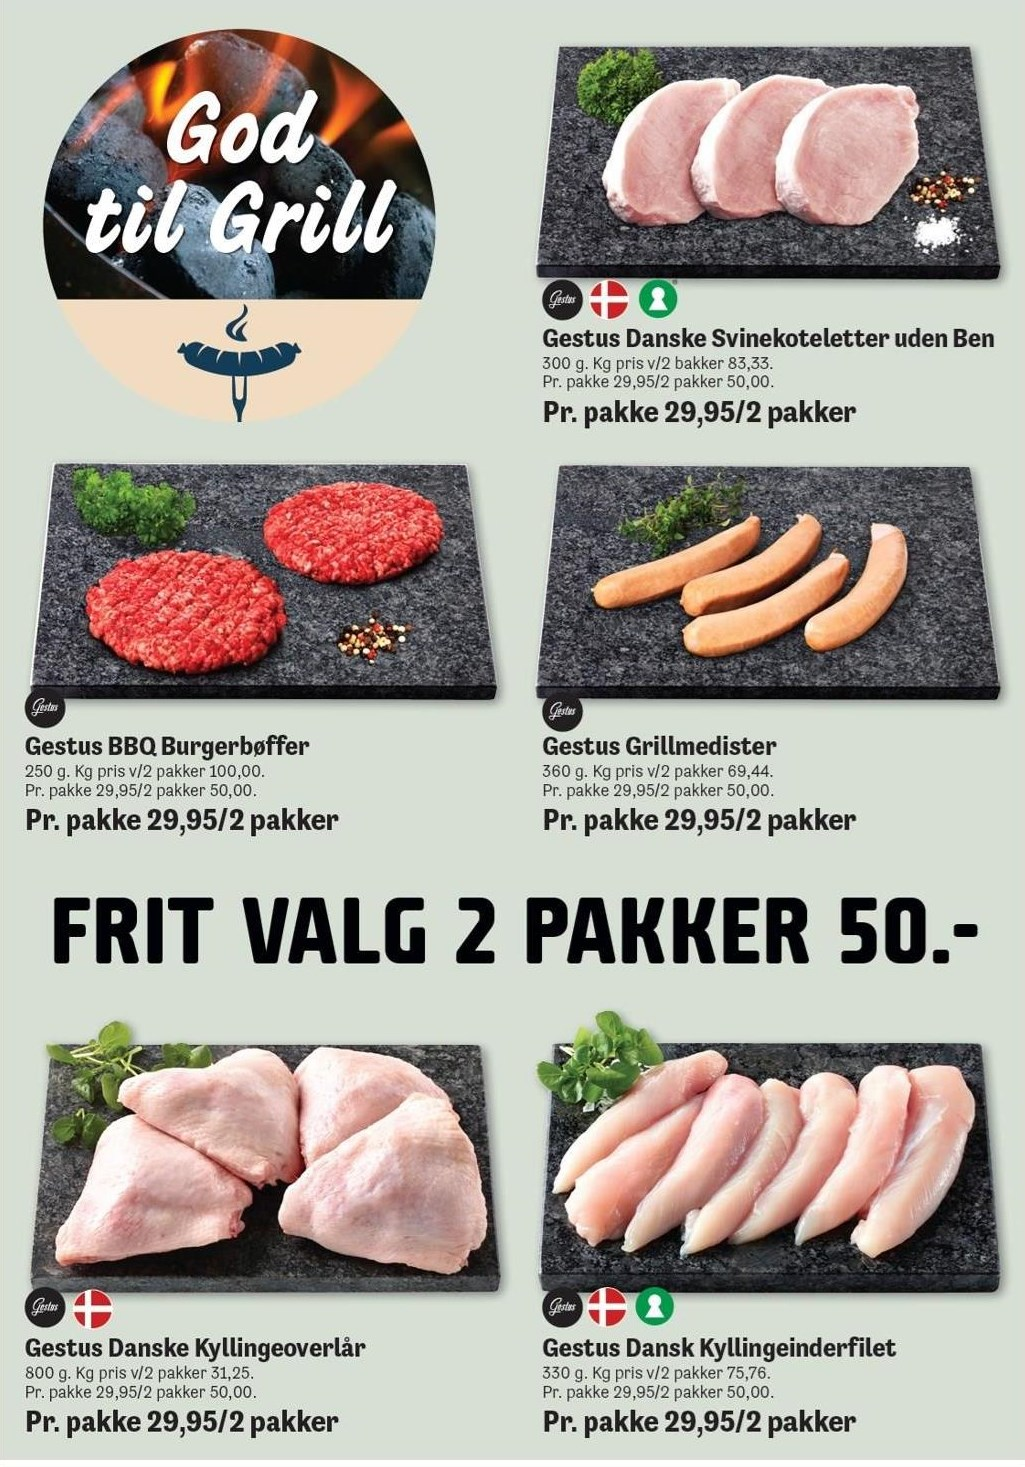 Gestus Burgerbøffer, grillmedister, svinekoteletter, kyllingeoverlår eller kyllingeinderfilet - 2 pakker